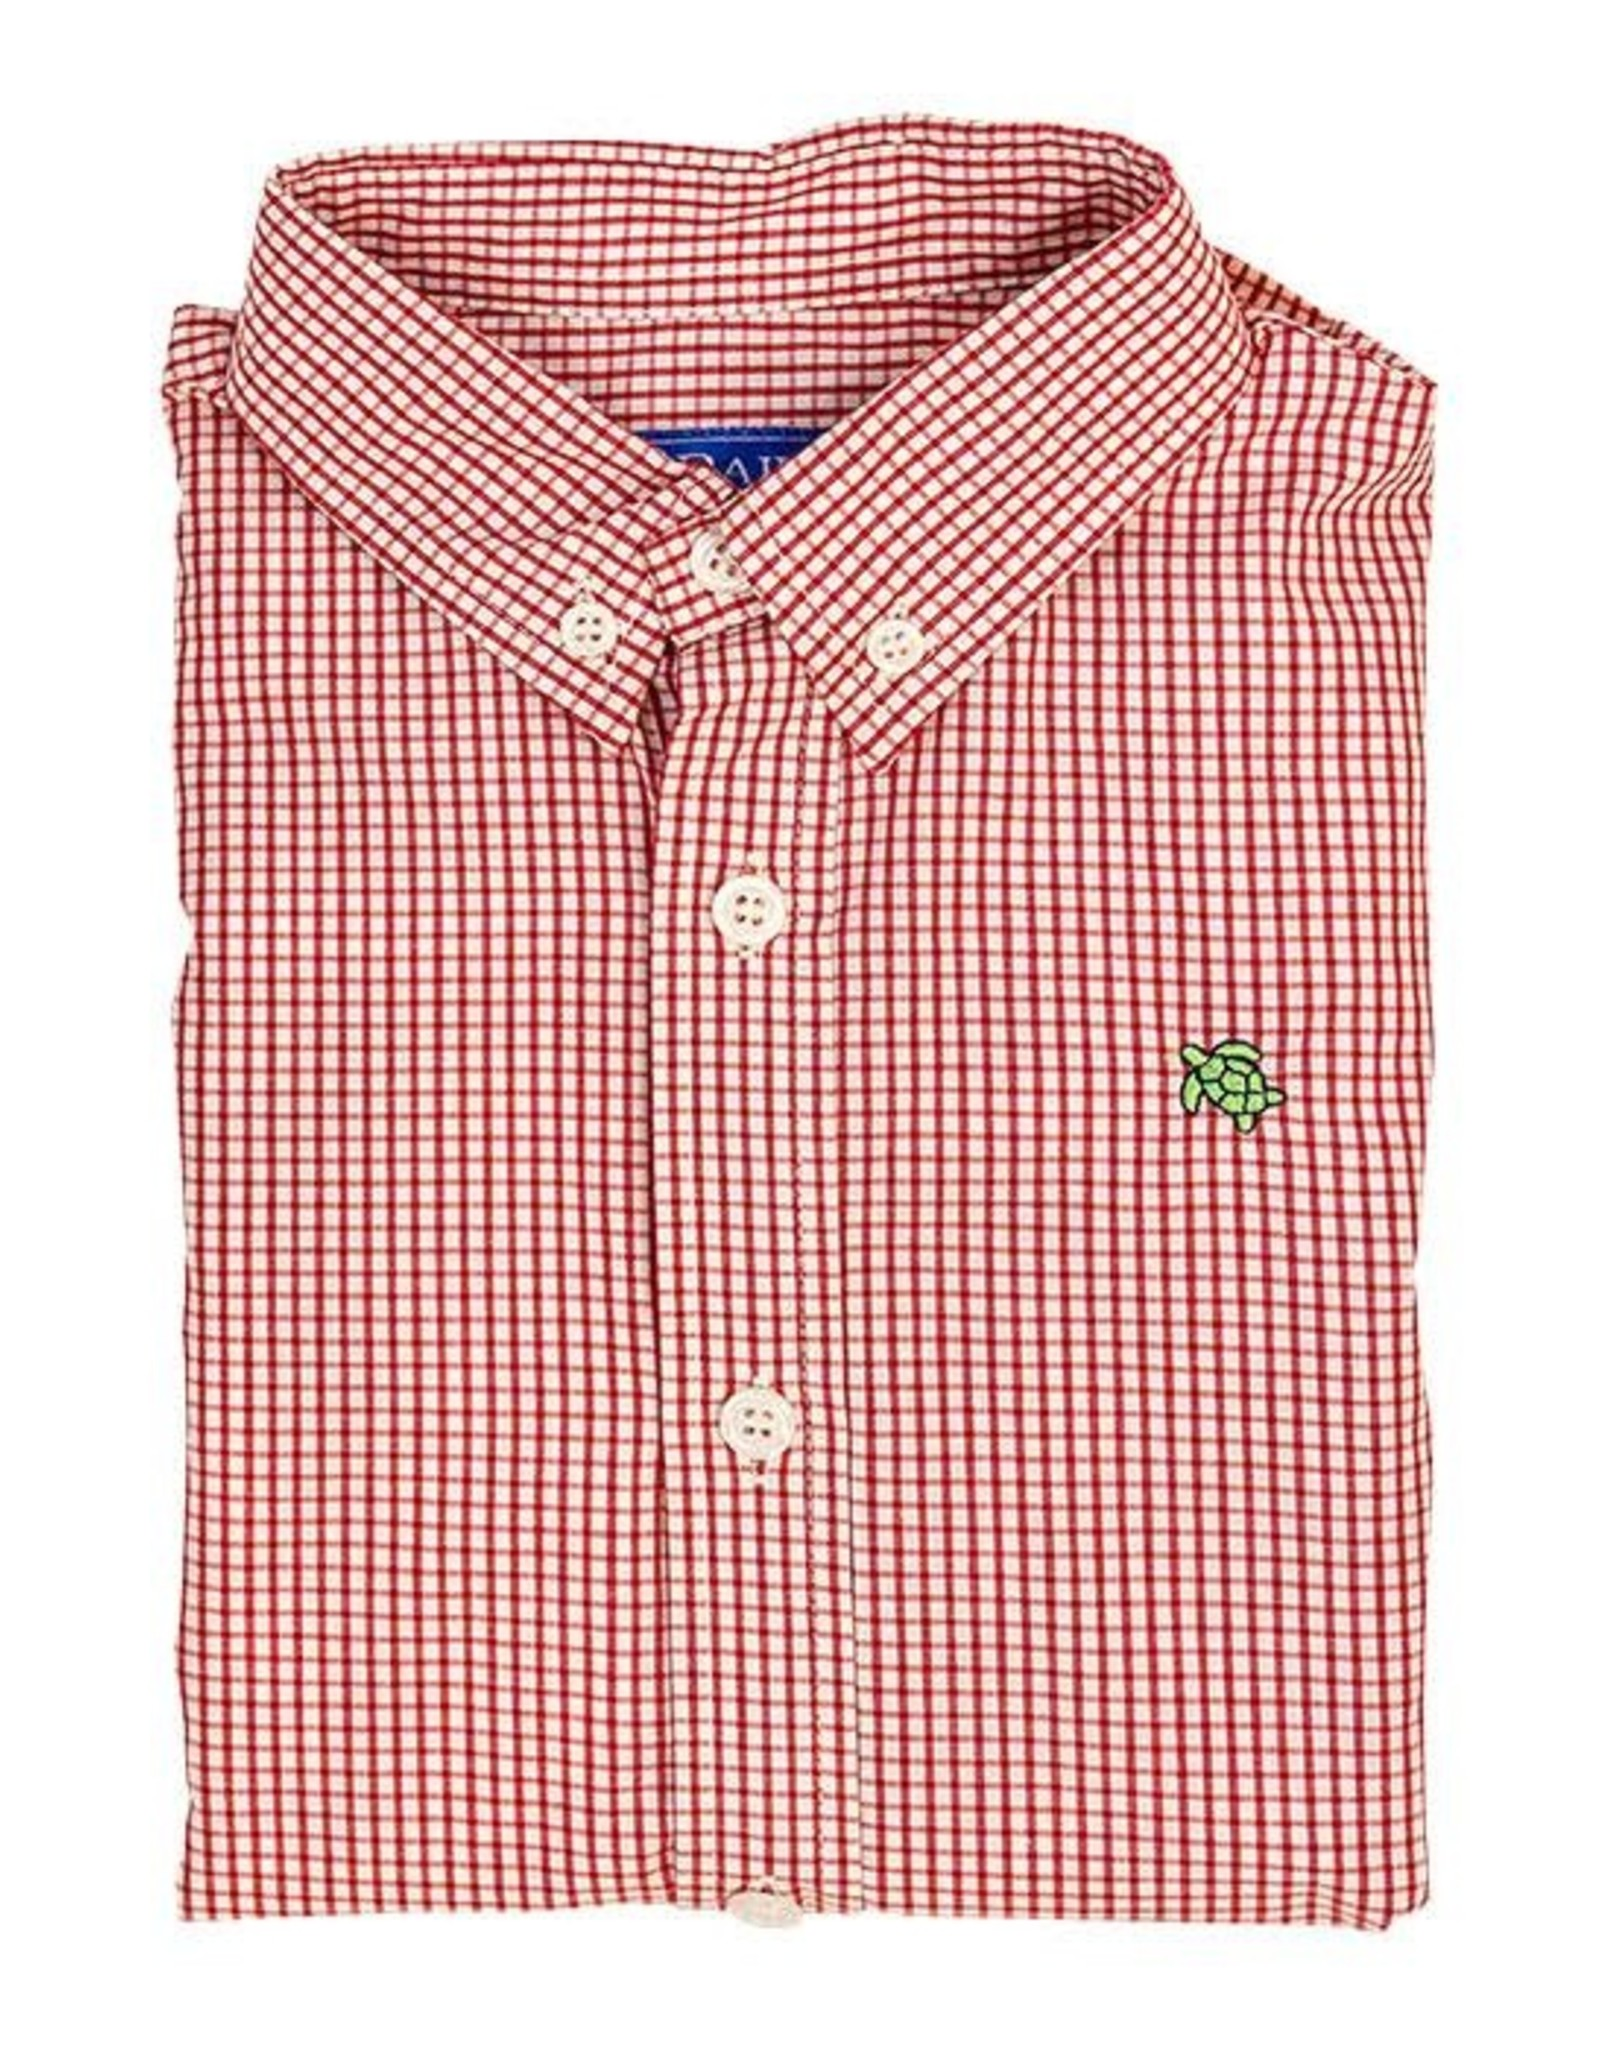 The Bailey Boys Button Down, Red Windowpane Shirt